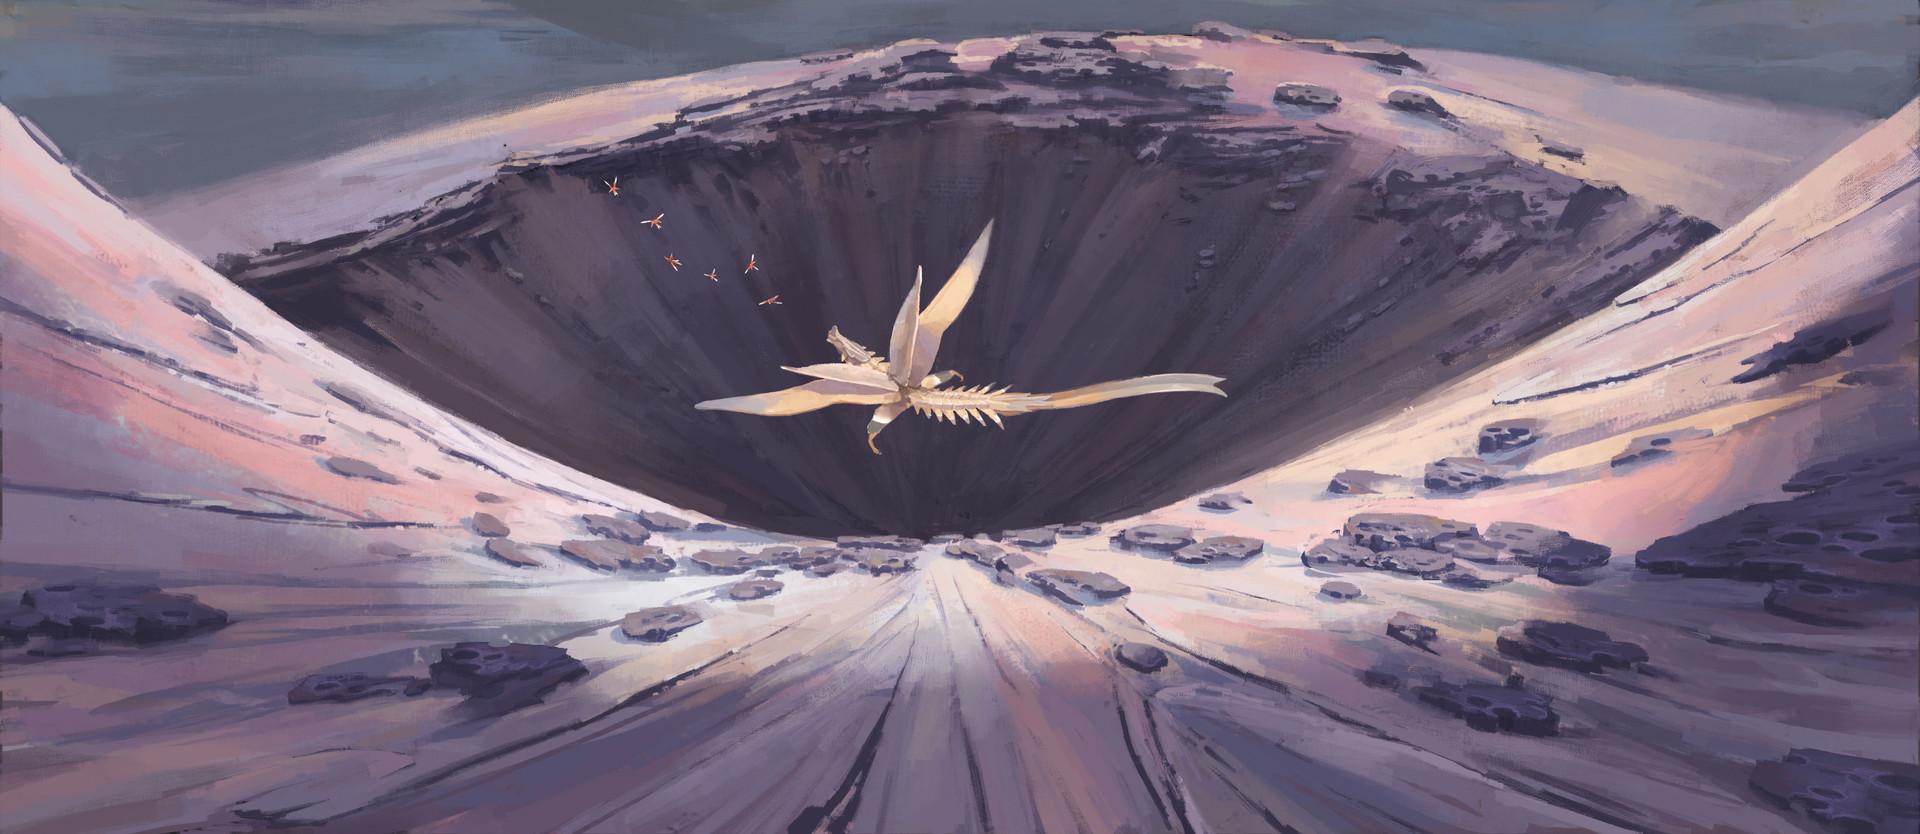 [Reflexion] Les oeuvres qui vous inspirent Alexander-ostrowski-03-crater2